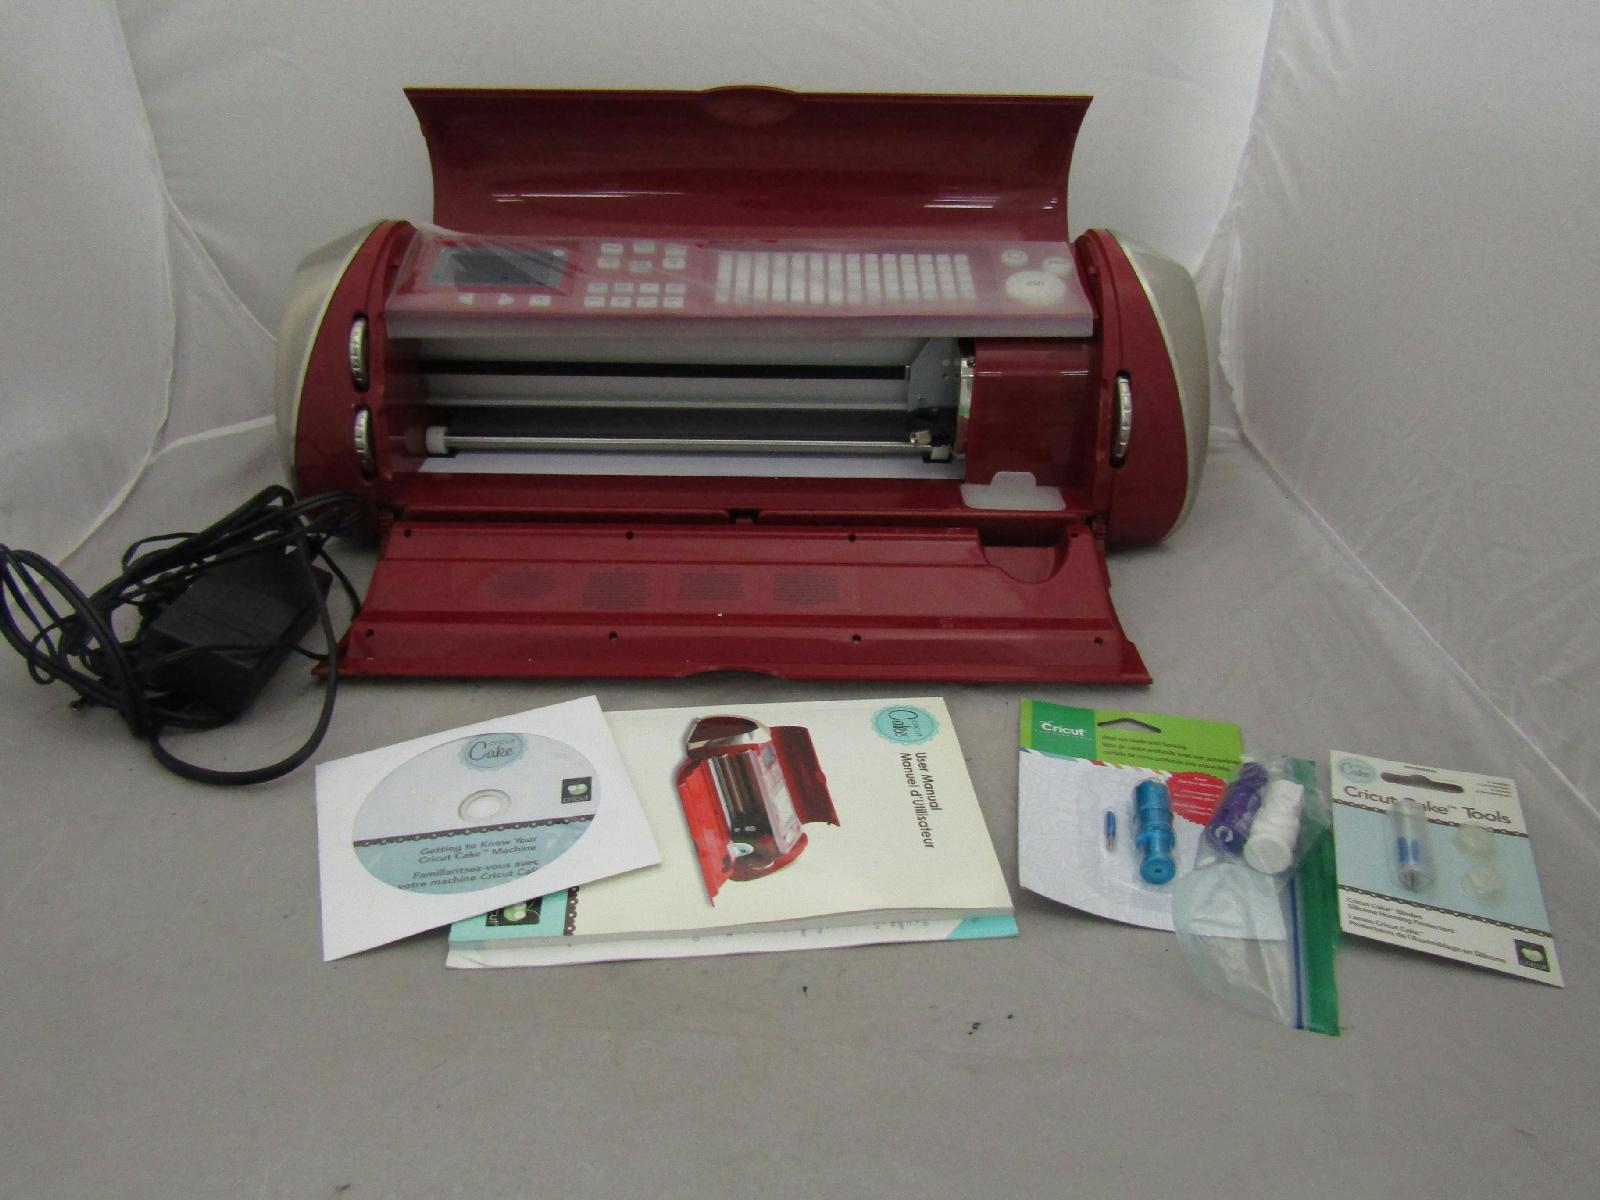 Cricut cake personal electronic cutting machine model for The cricut craft machine